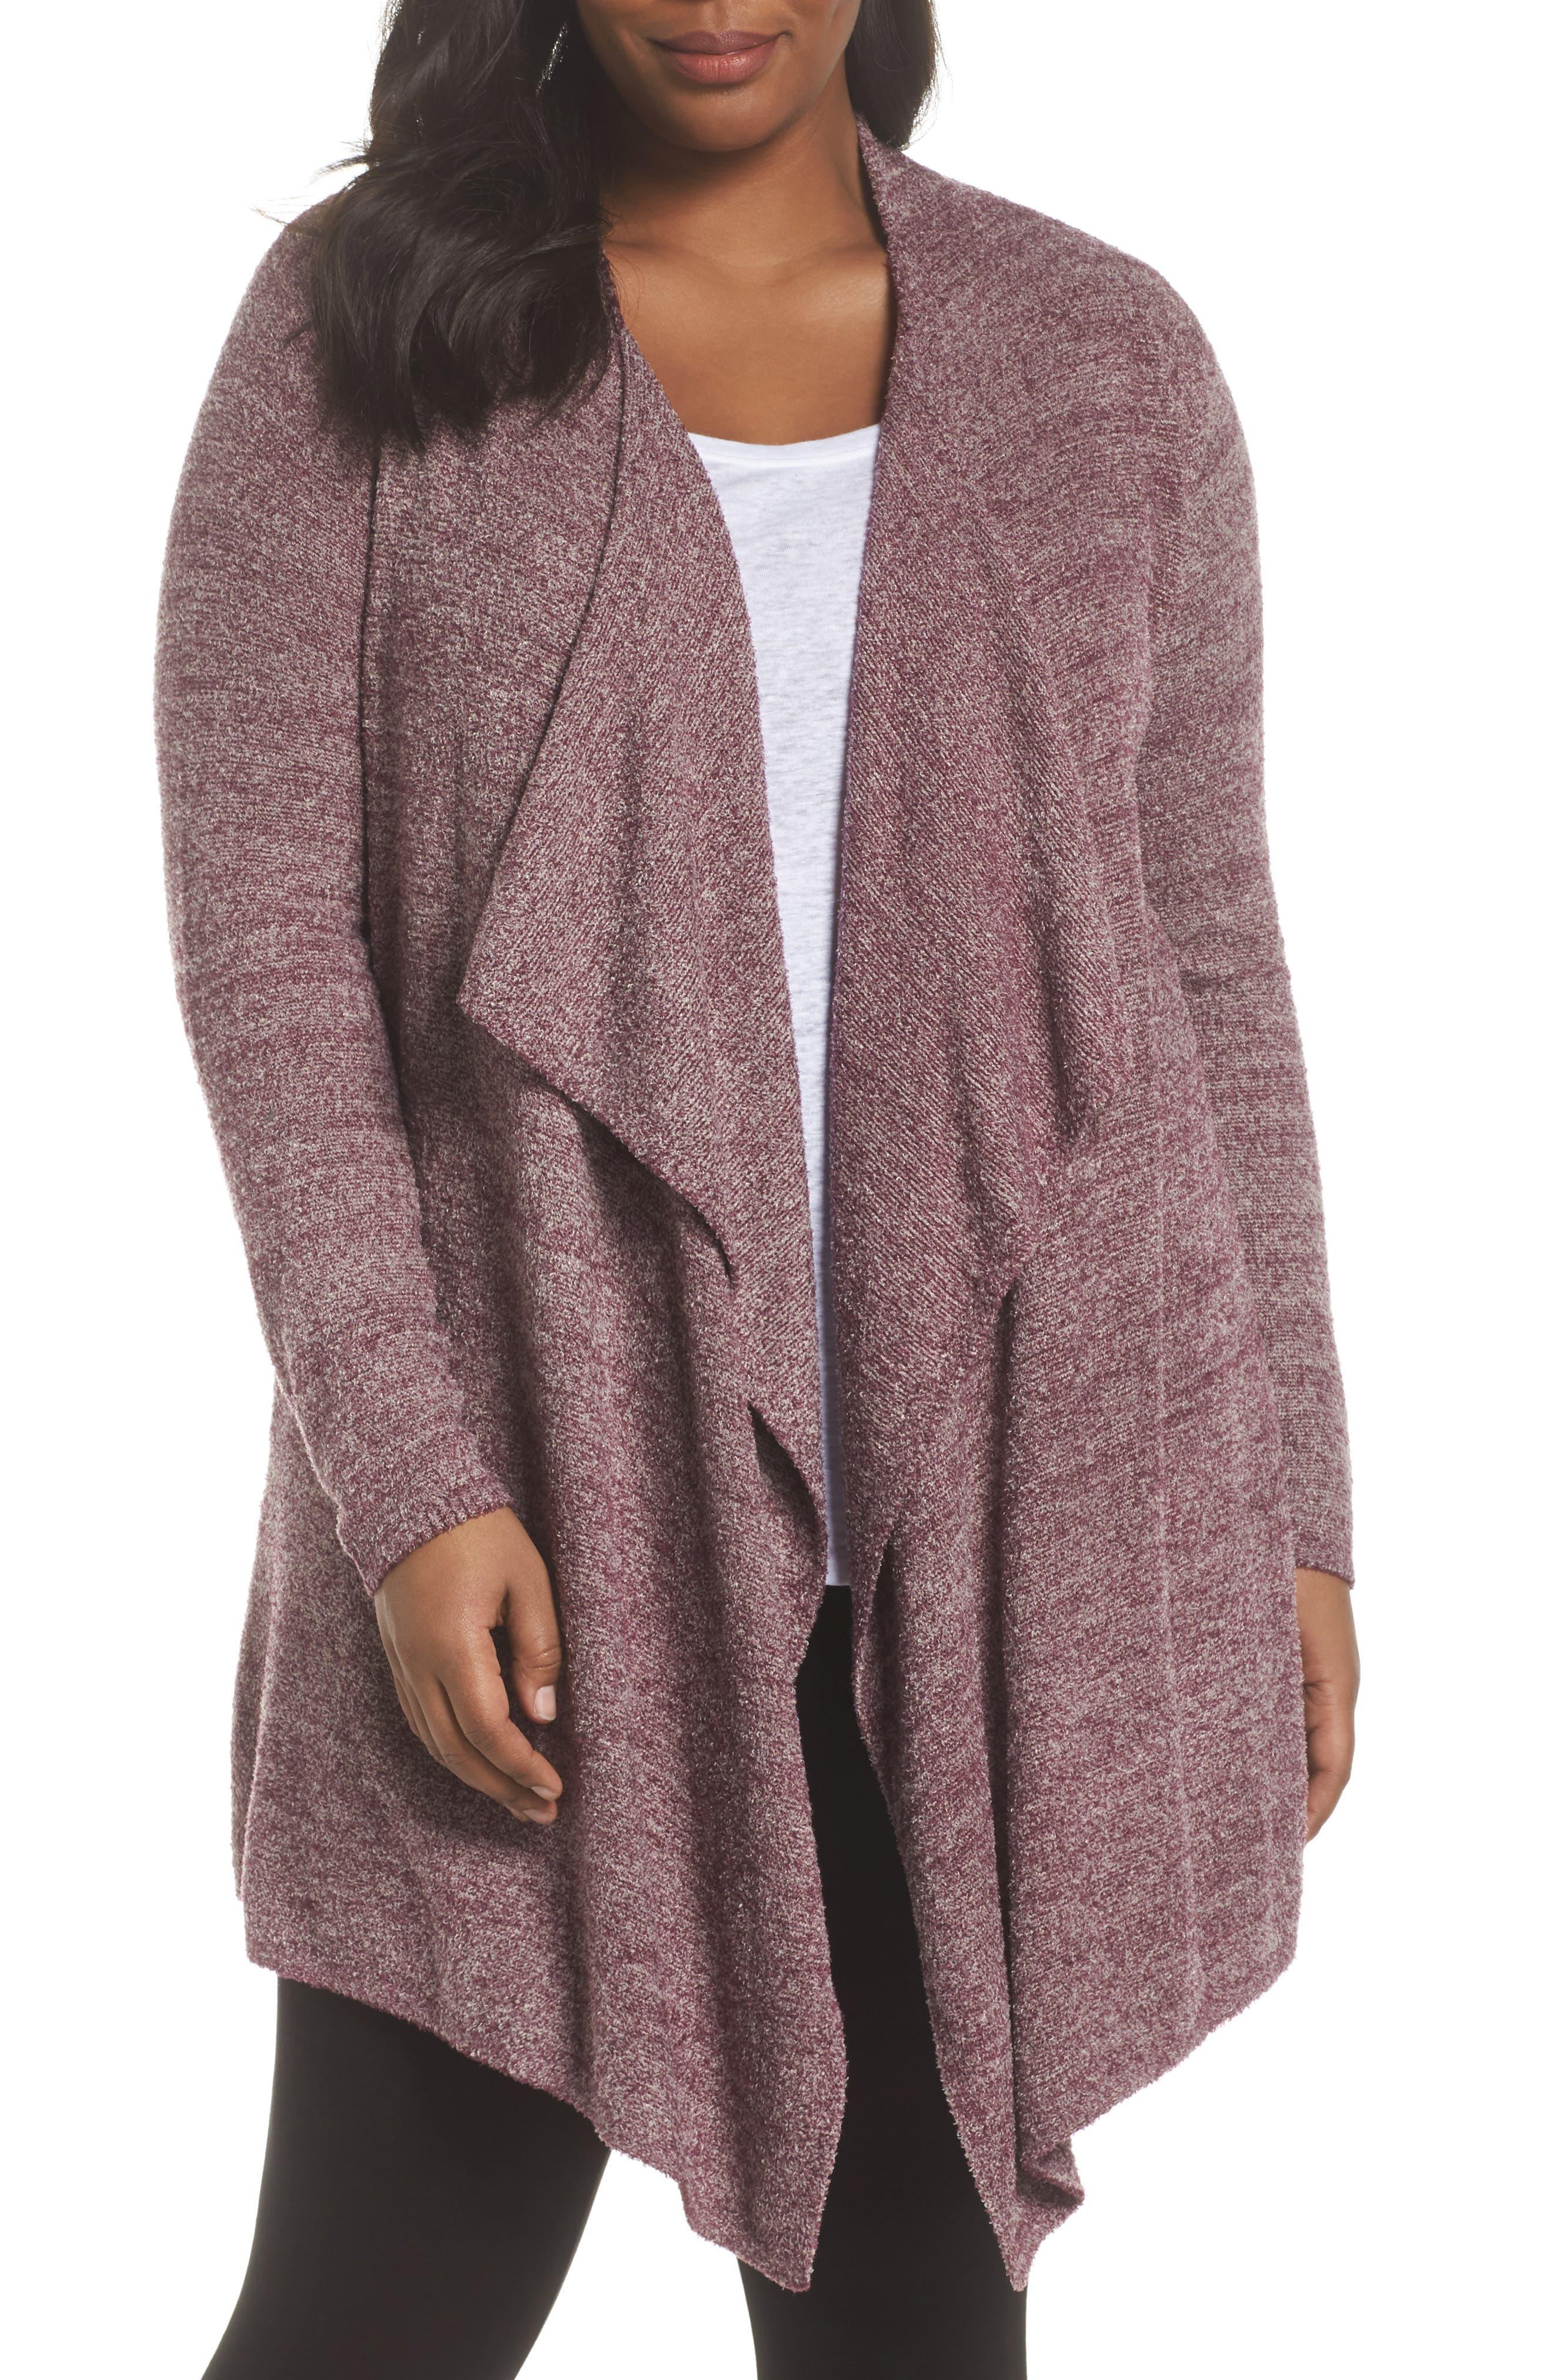 Barefoot Dreams® CozyChic Lite® Calypso Wrap Cardigan (Plus Size) (Nordstrom Exclusive)